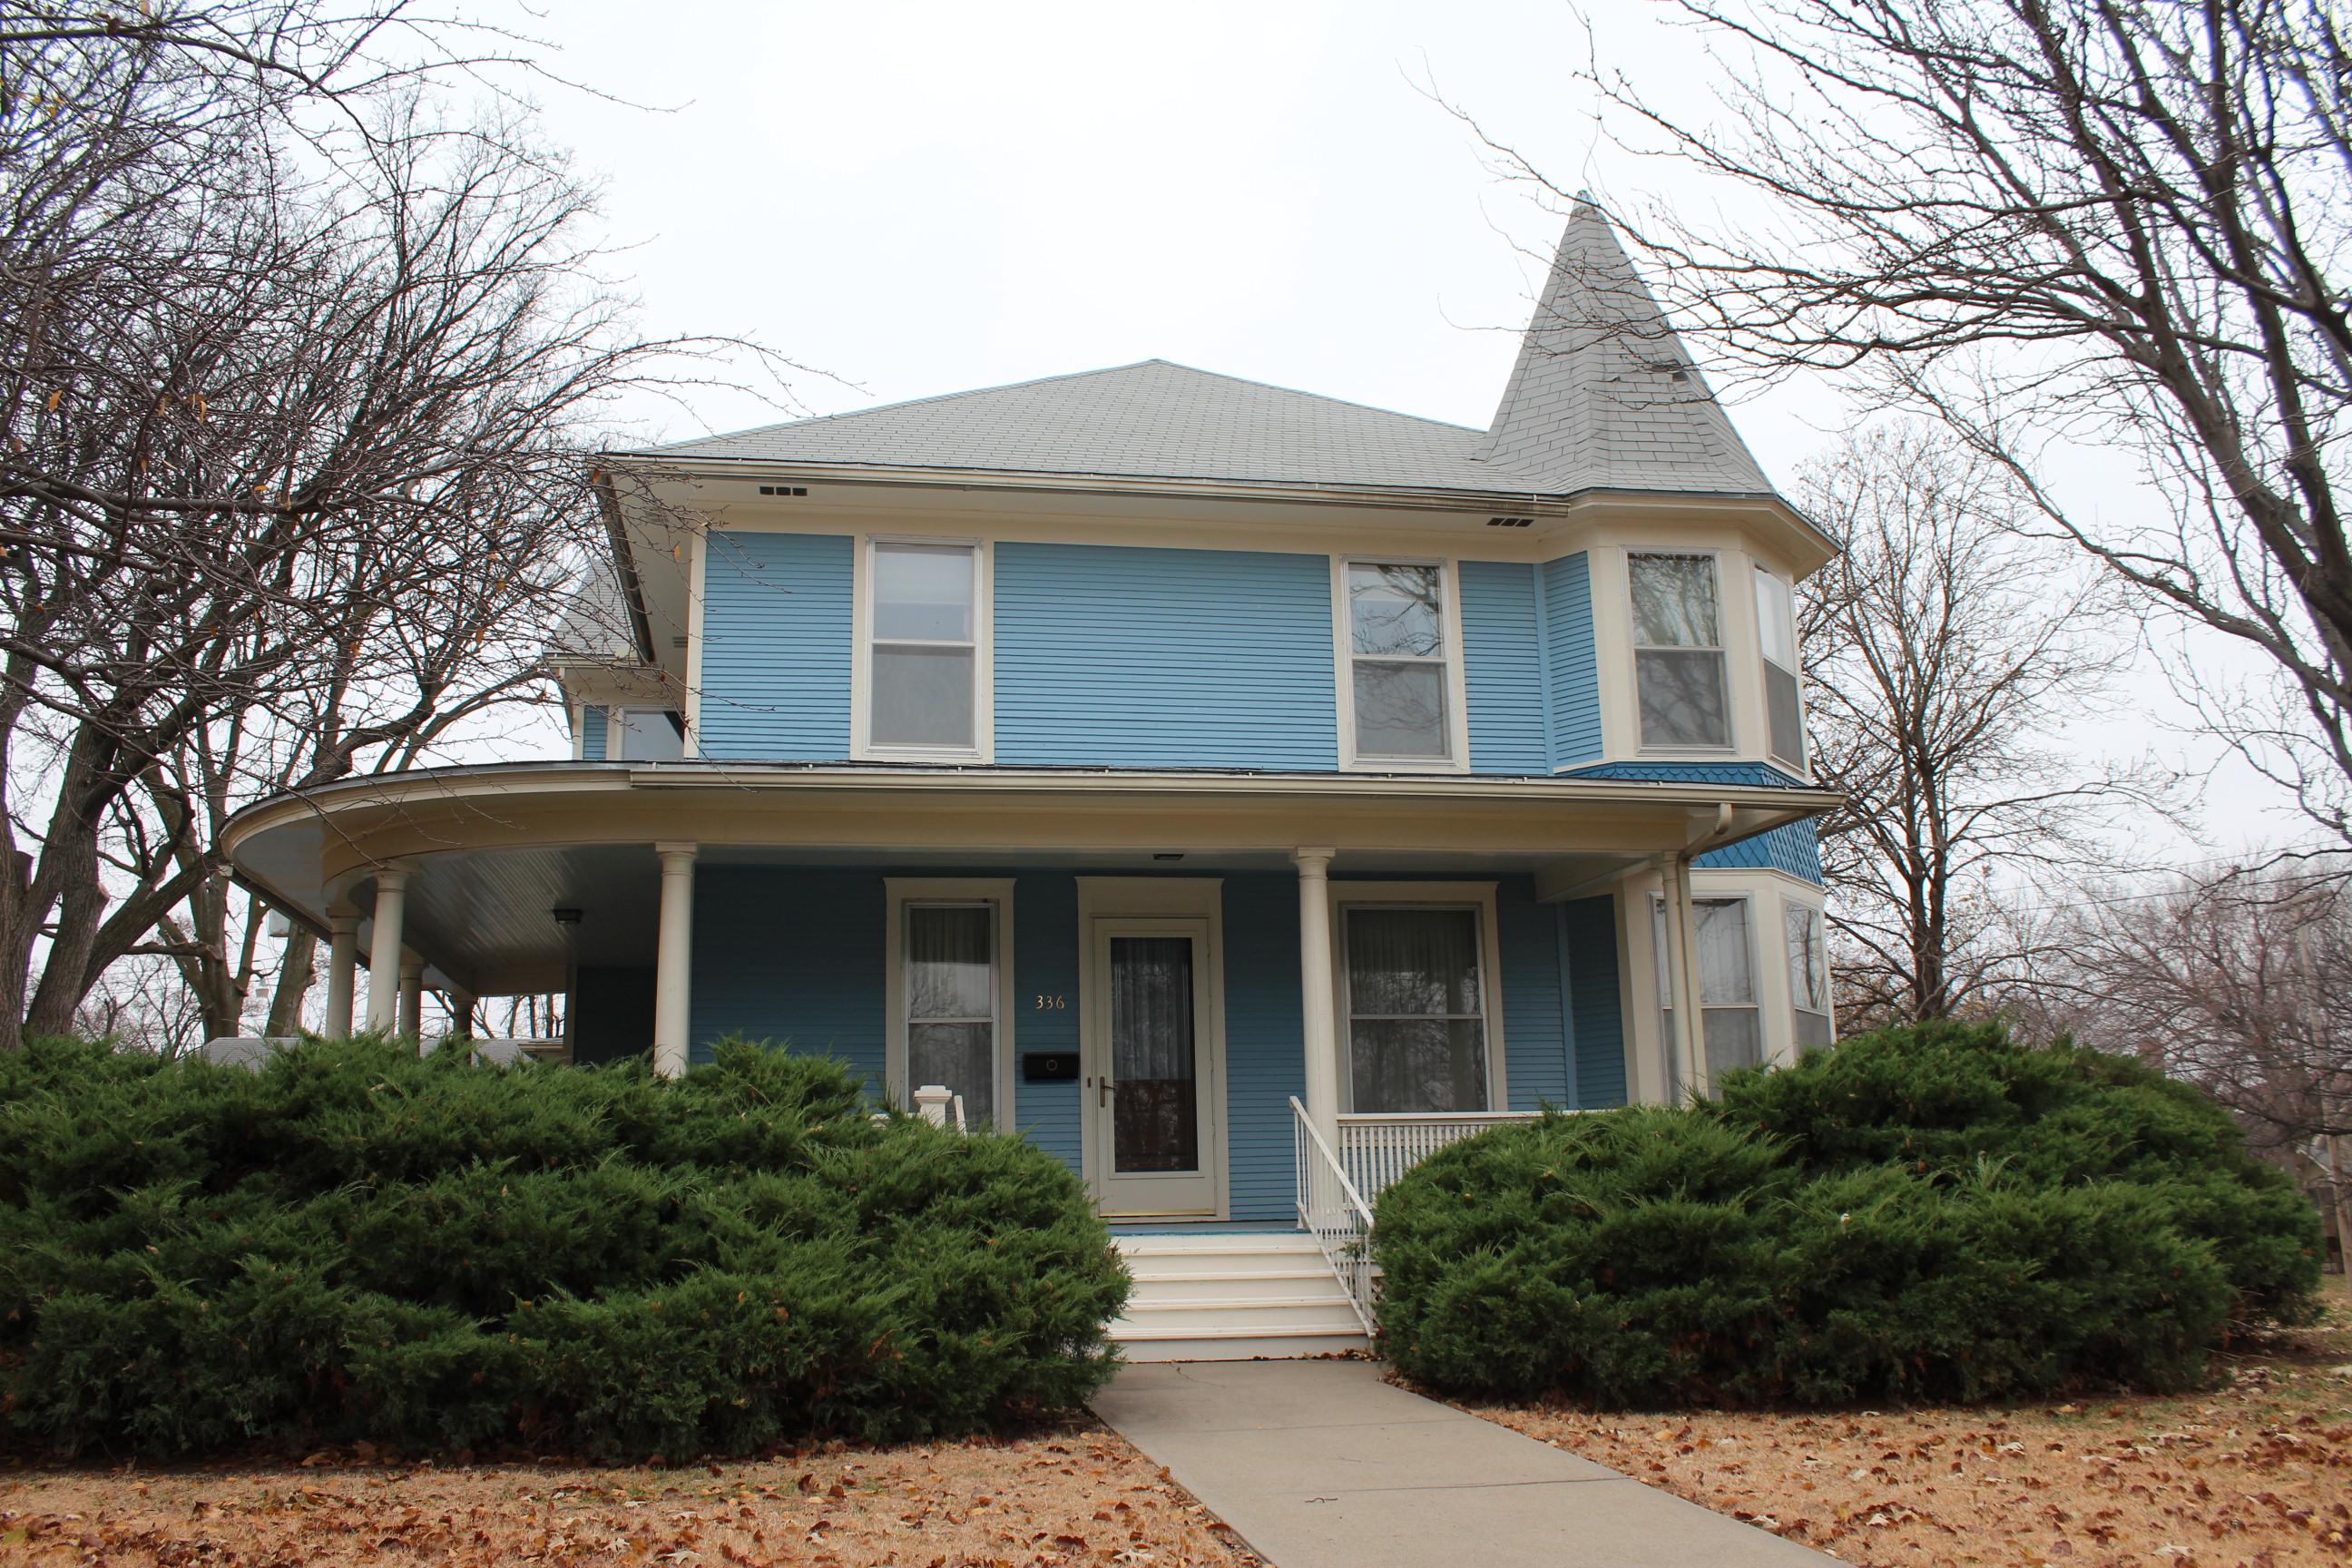 336 West 9th Street, Concordia, Kansas 66901